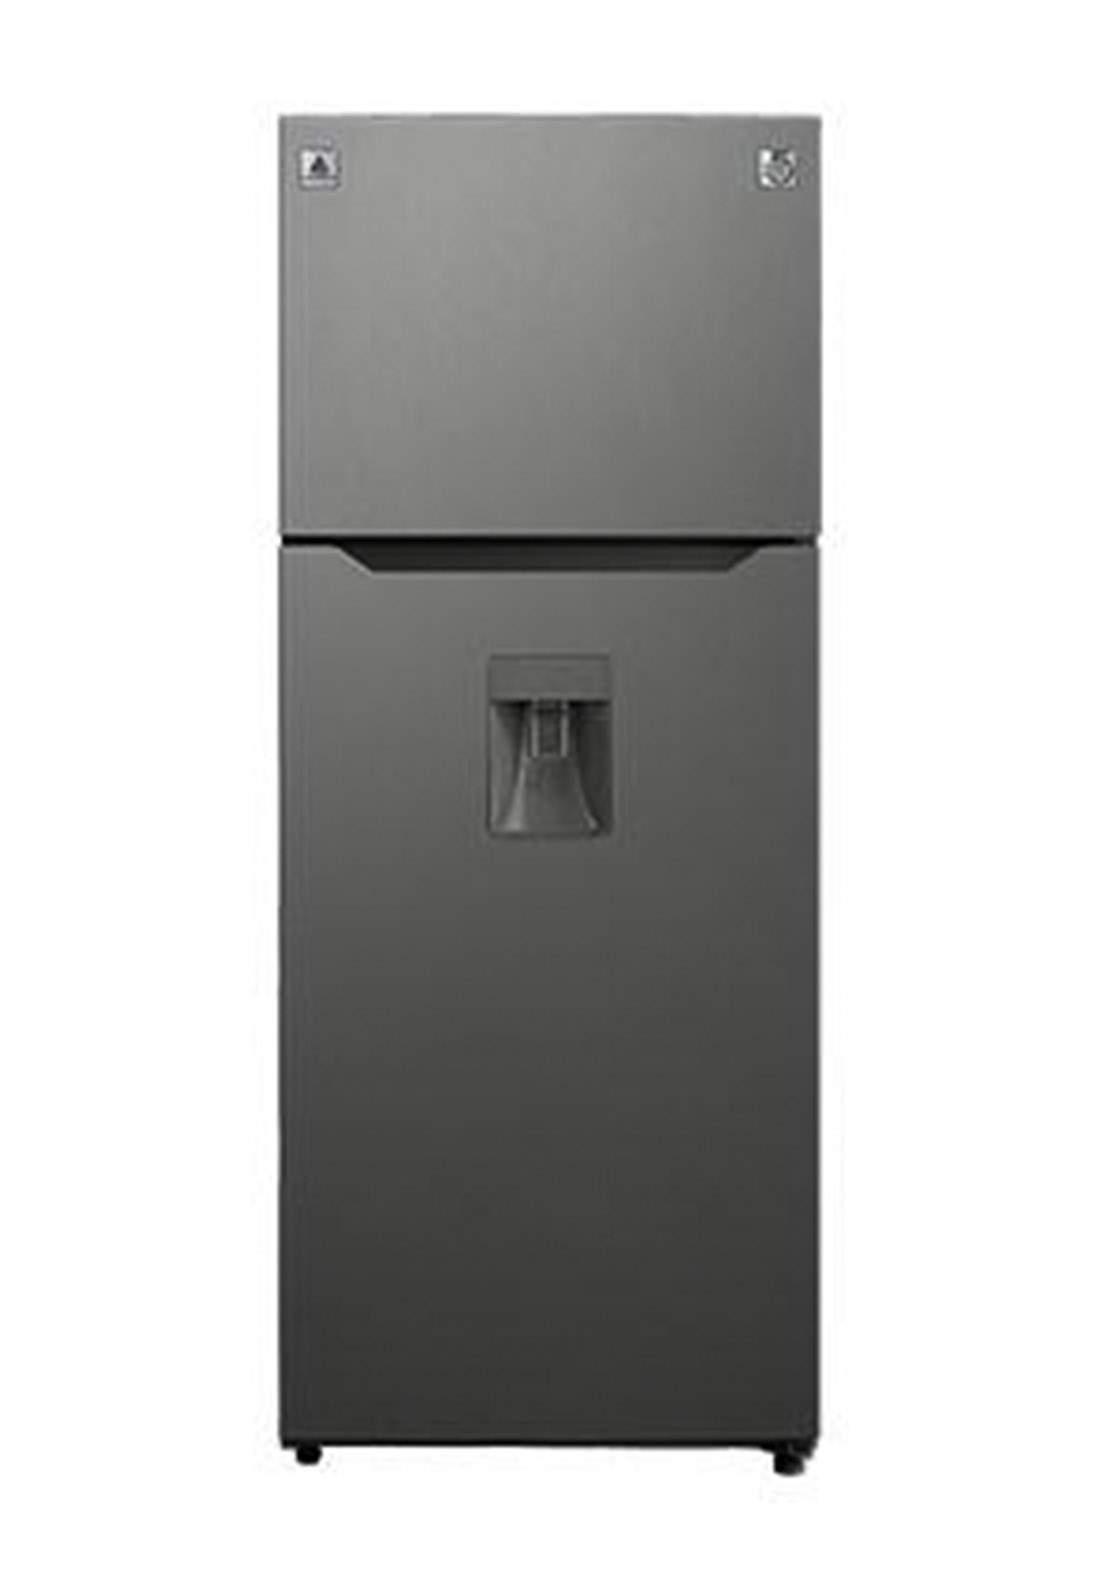 Alhafidh (RFHA-TM650DCS) 22cf Direct Cool Top Mount Refrigerator ثلاجة بابين